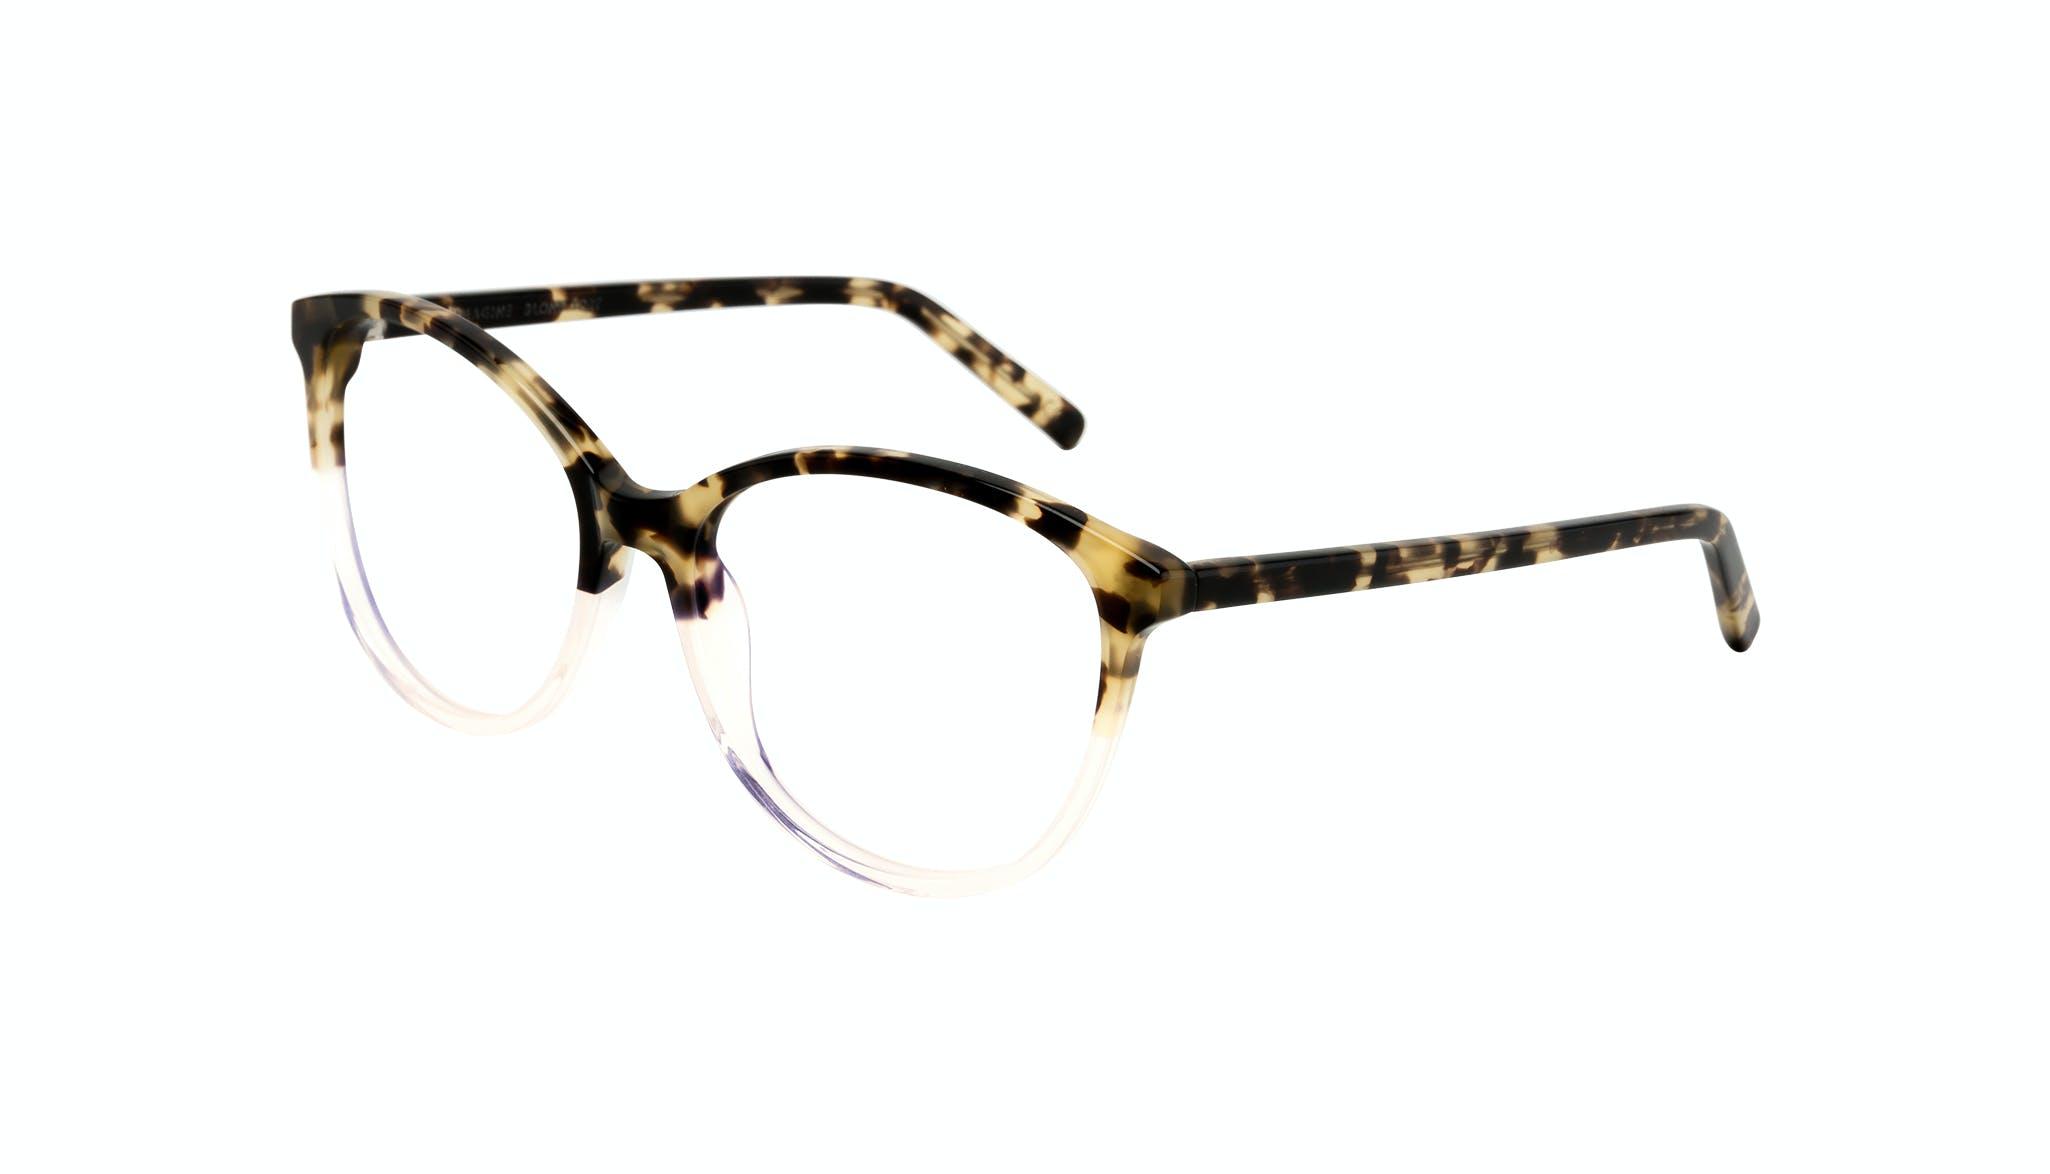 Affordable Fashion Glasses Round Eyeglasses Women Imagine Blond Tort Tilt